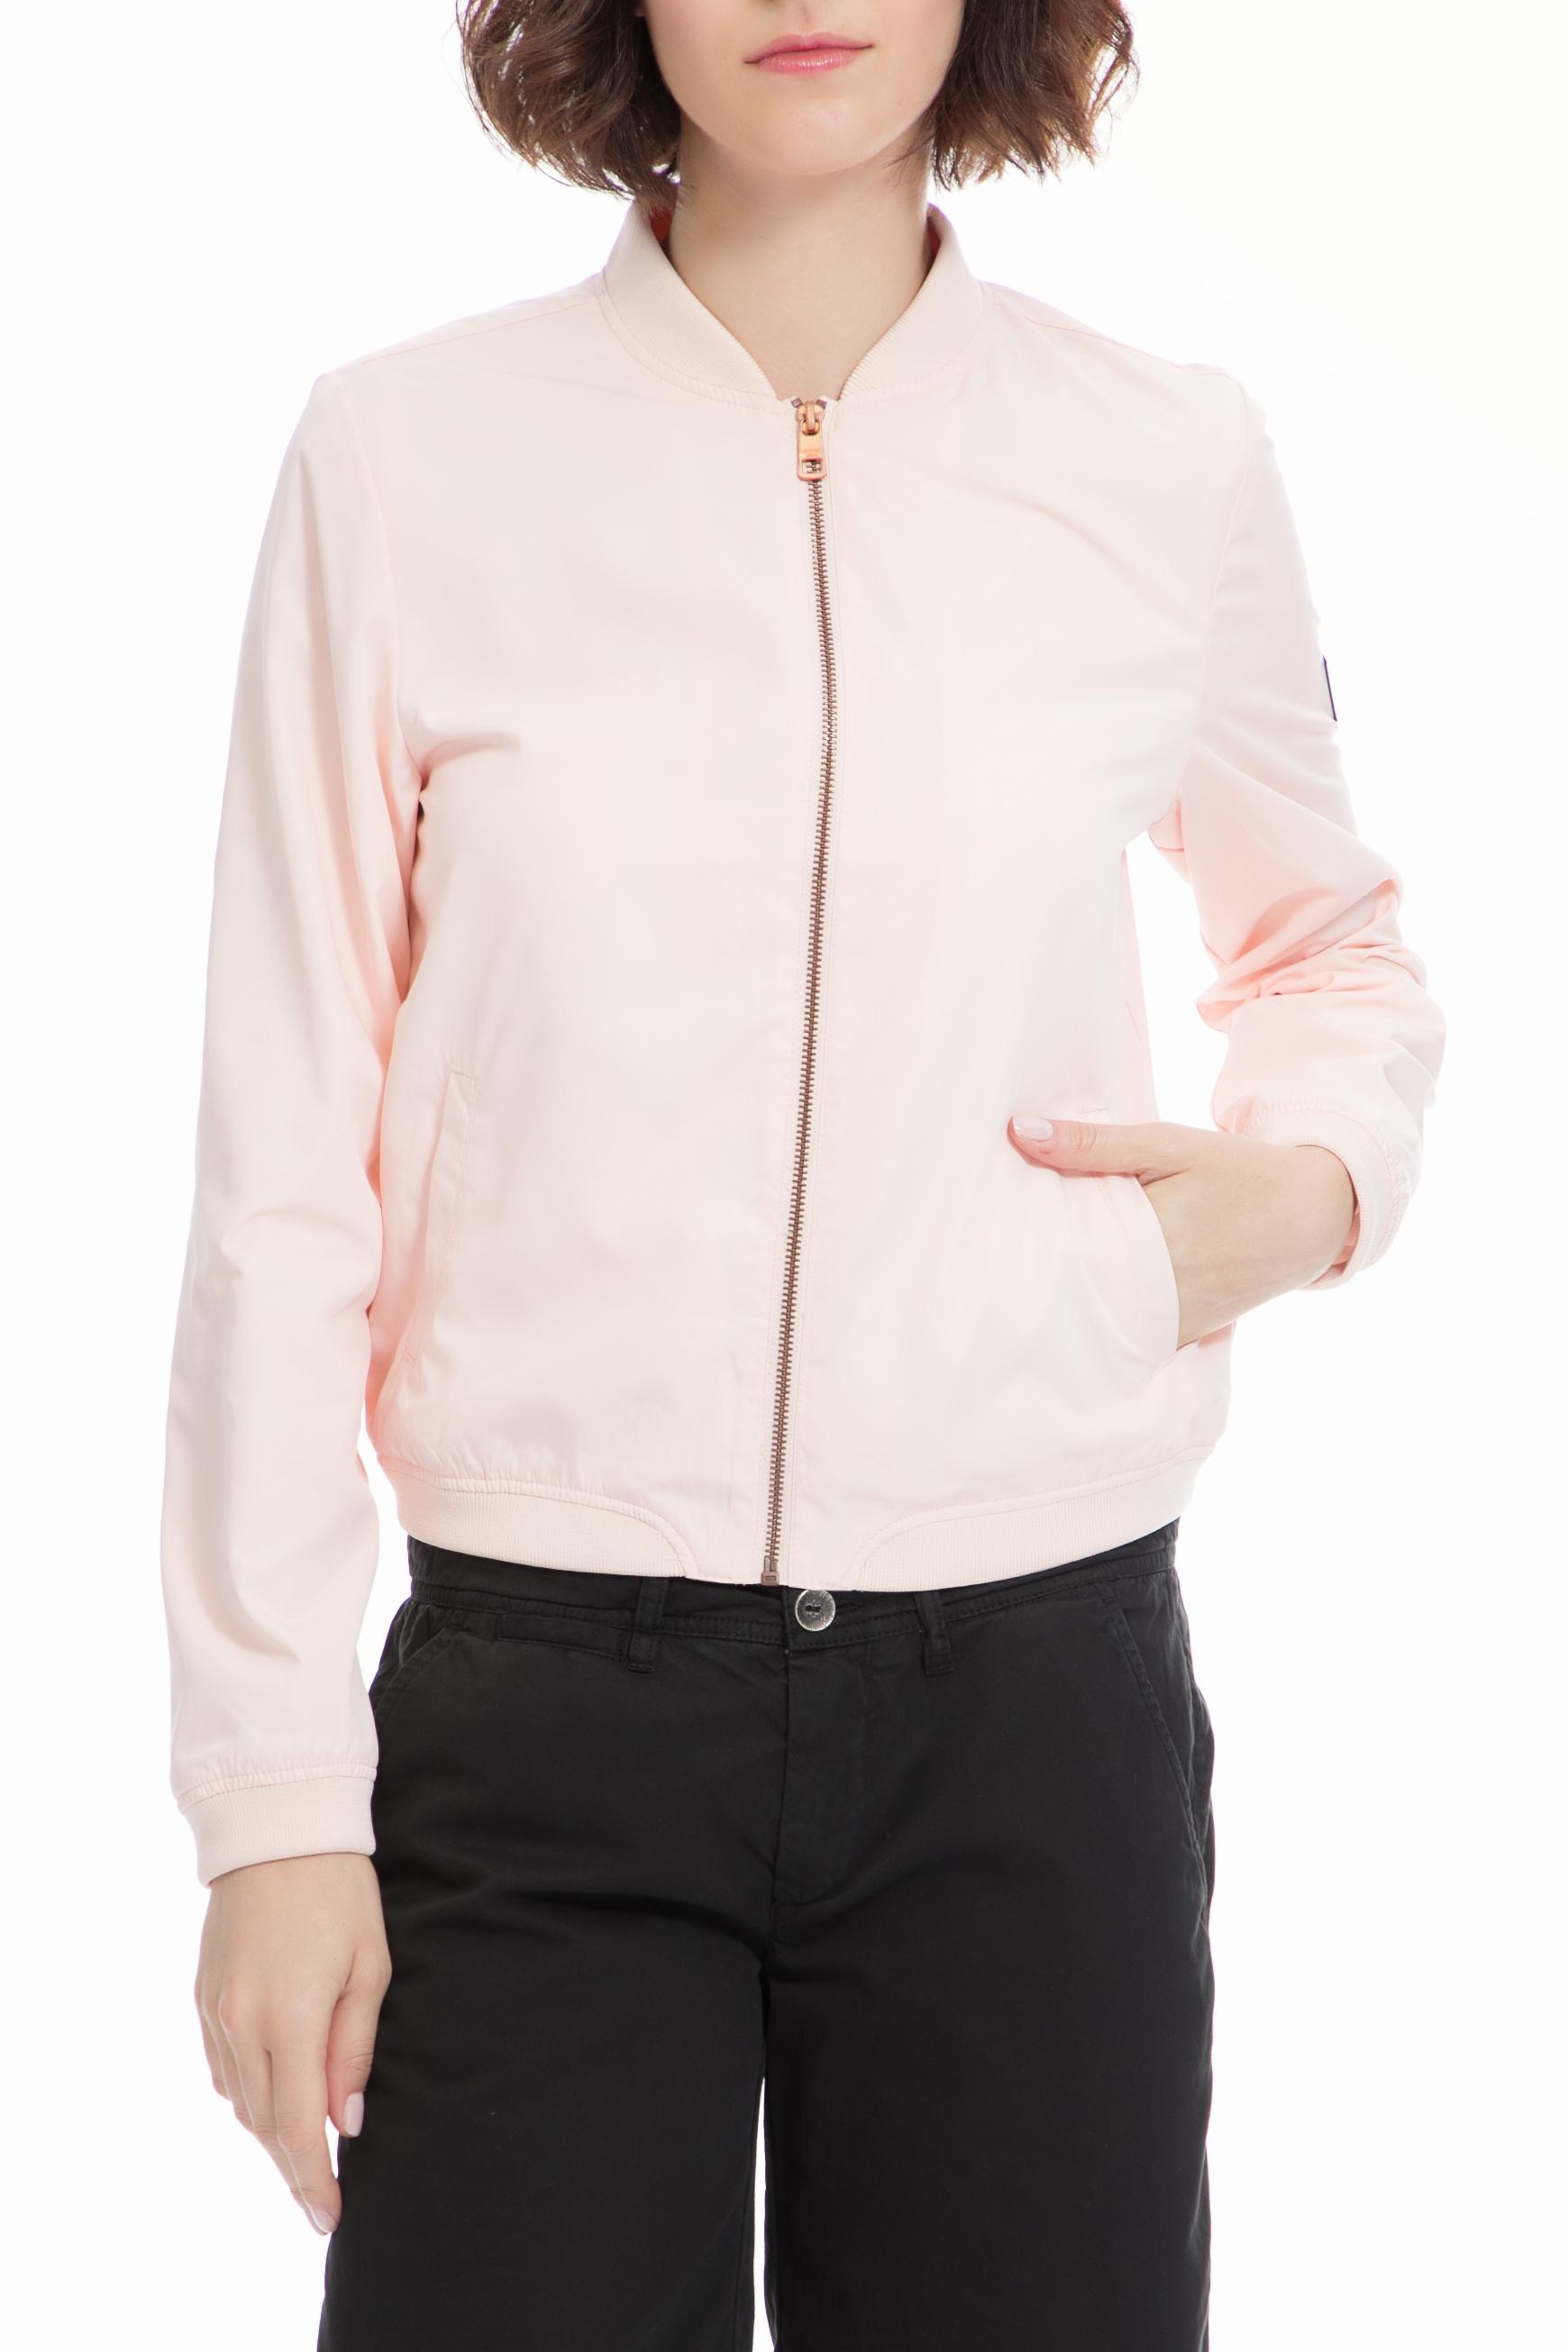 CALVIN KLEIN JEANS - Γυναικείο μπουφάν CALVIN KLEIN JEANS ροζ γυναικεία ρούχα πανωφόρια μπουφάν